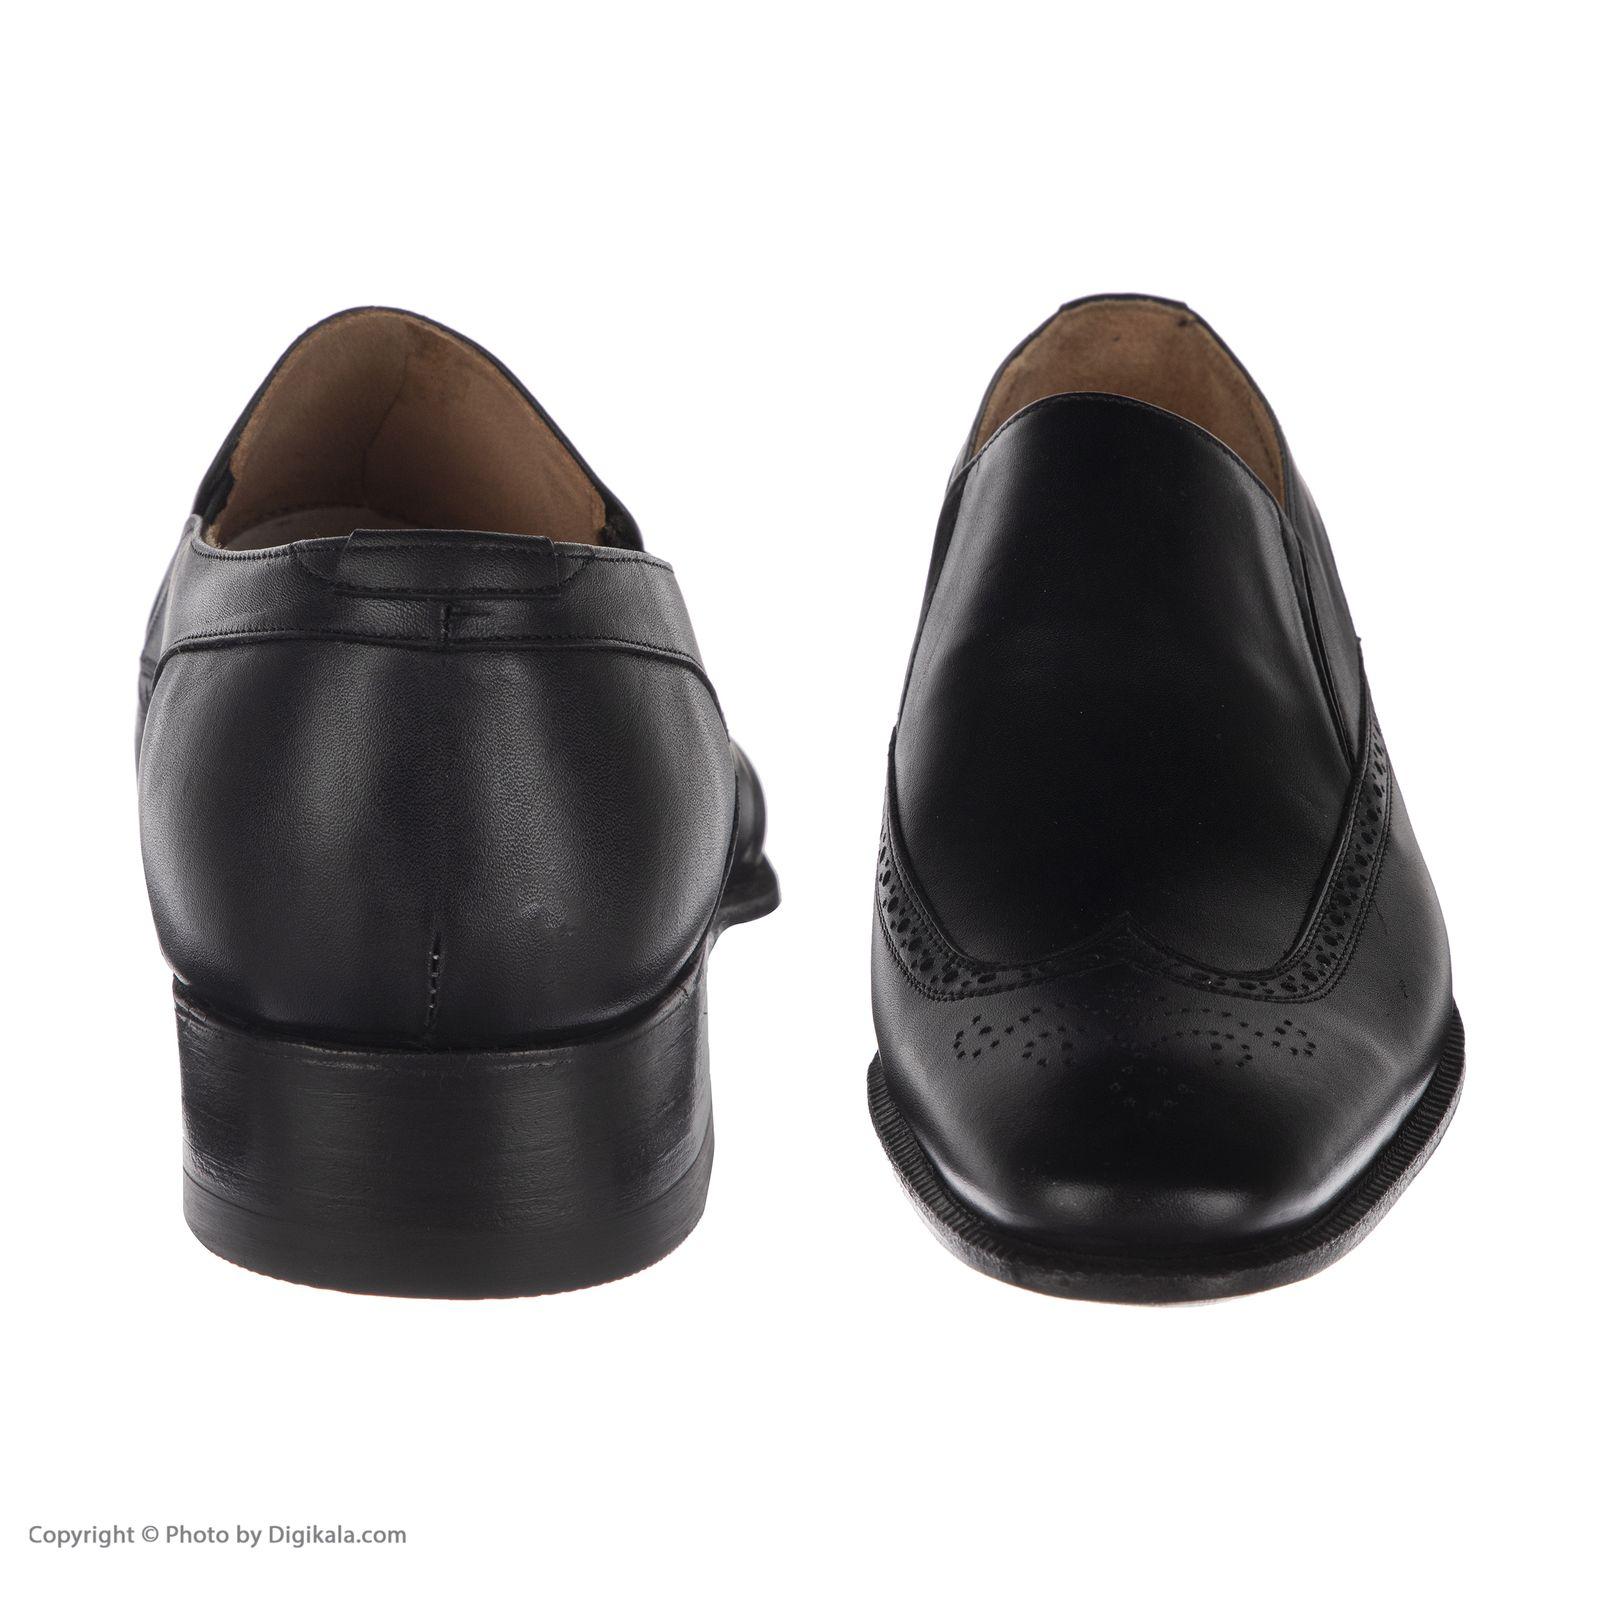 کفش مردانه نظری کد 435 -  - 3